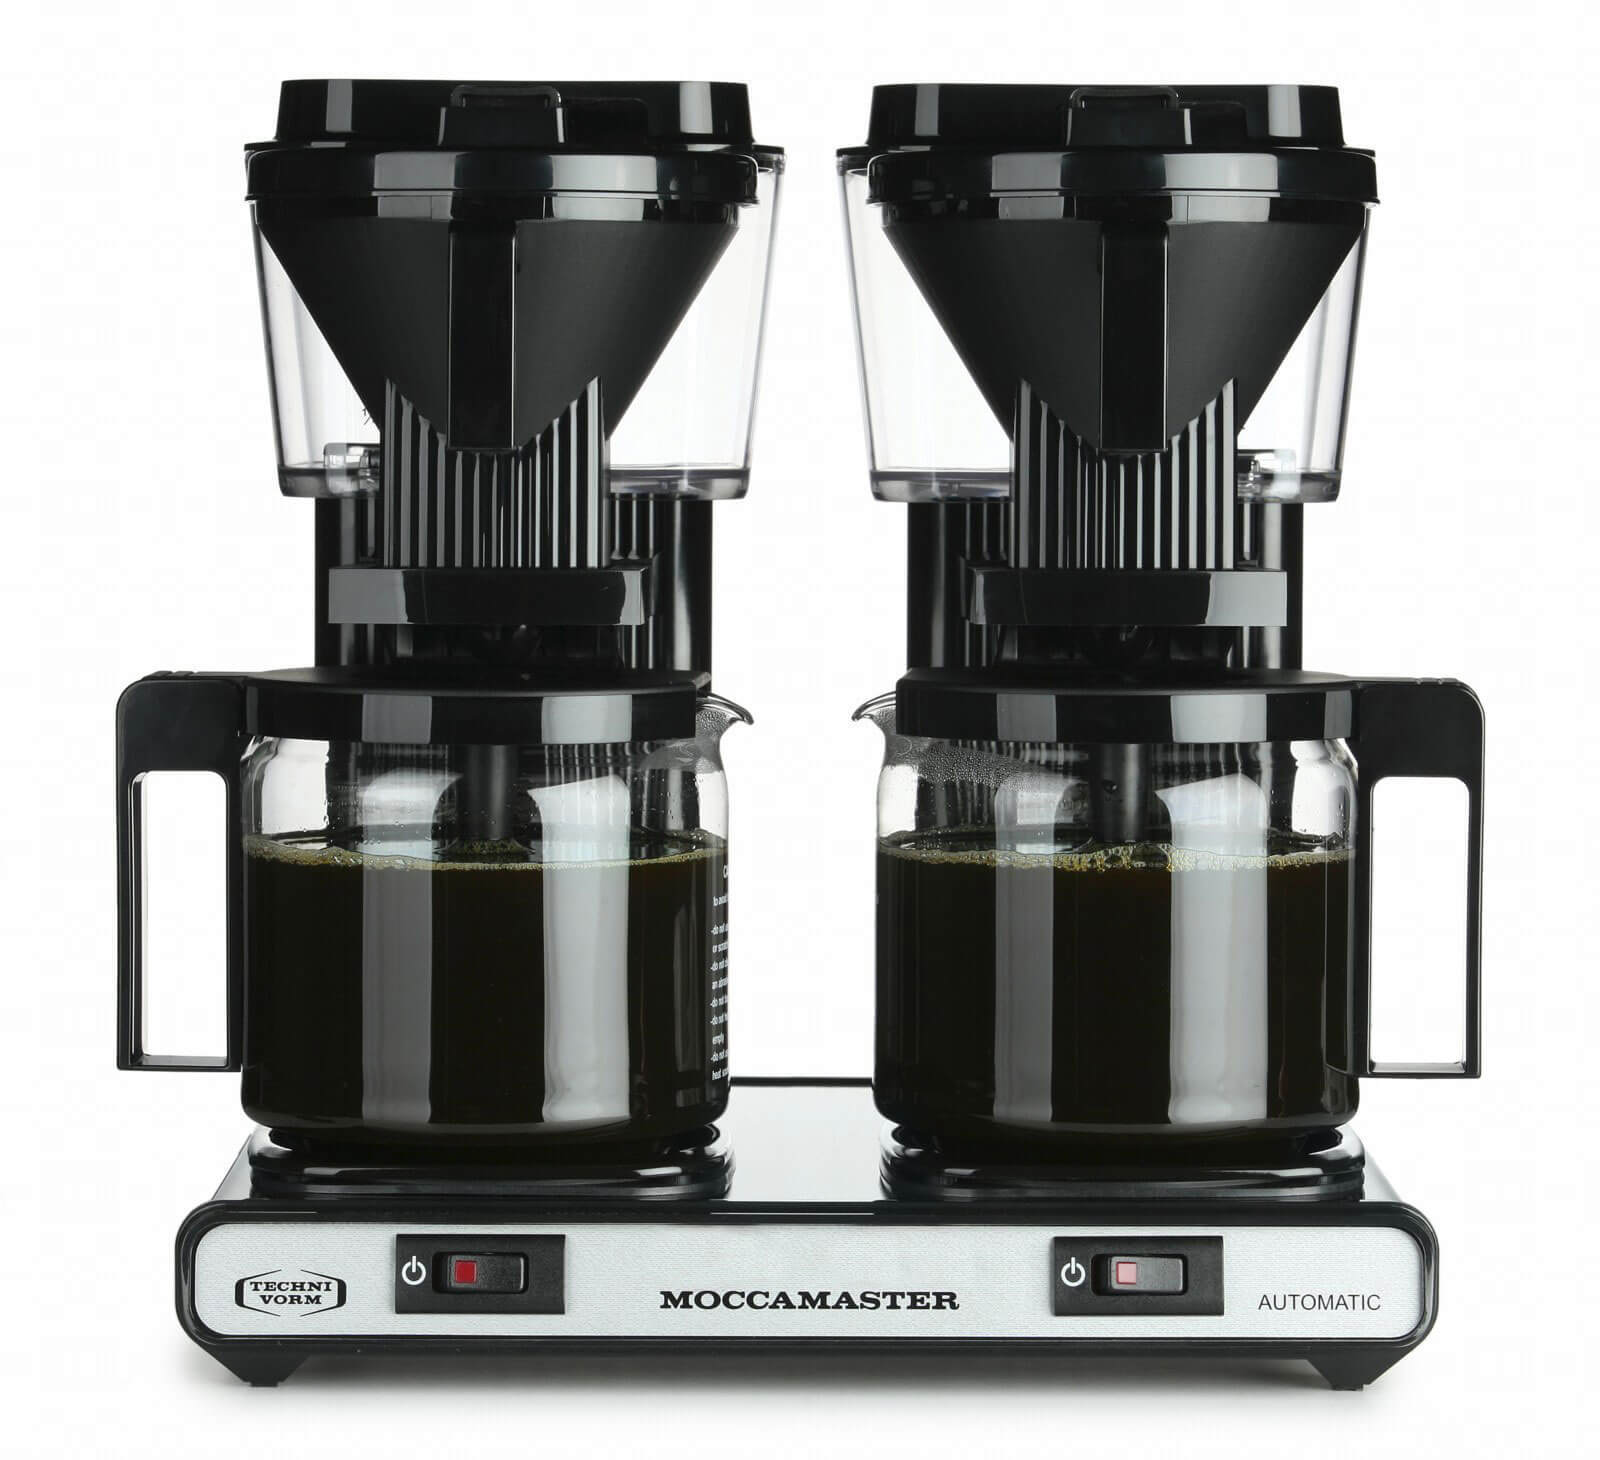 Moccamaster Kaffeeautomat KBG744 Black | Kamasega